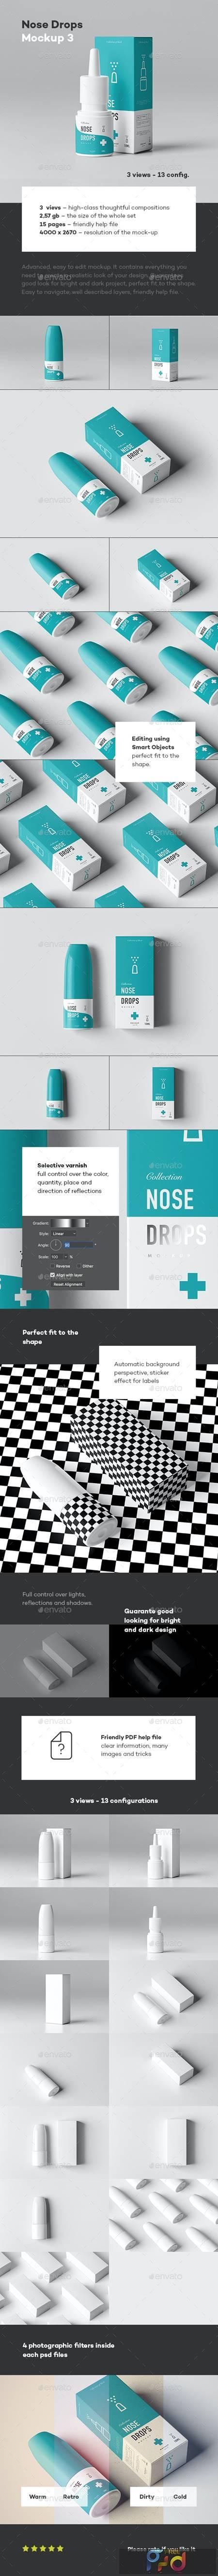 Nose Drops Mock-up 3 23059969 1